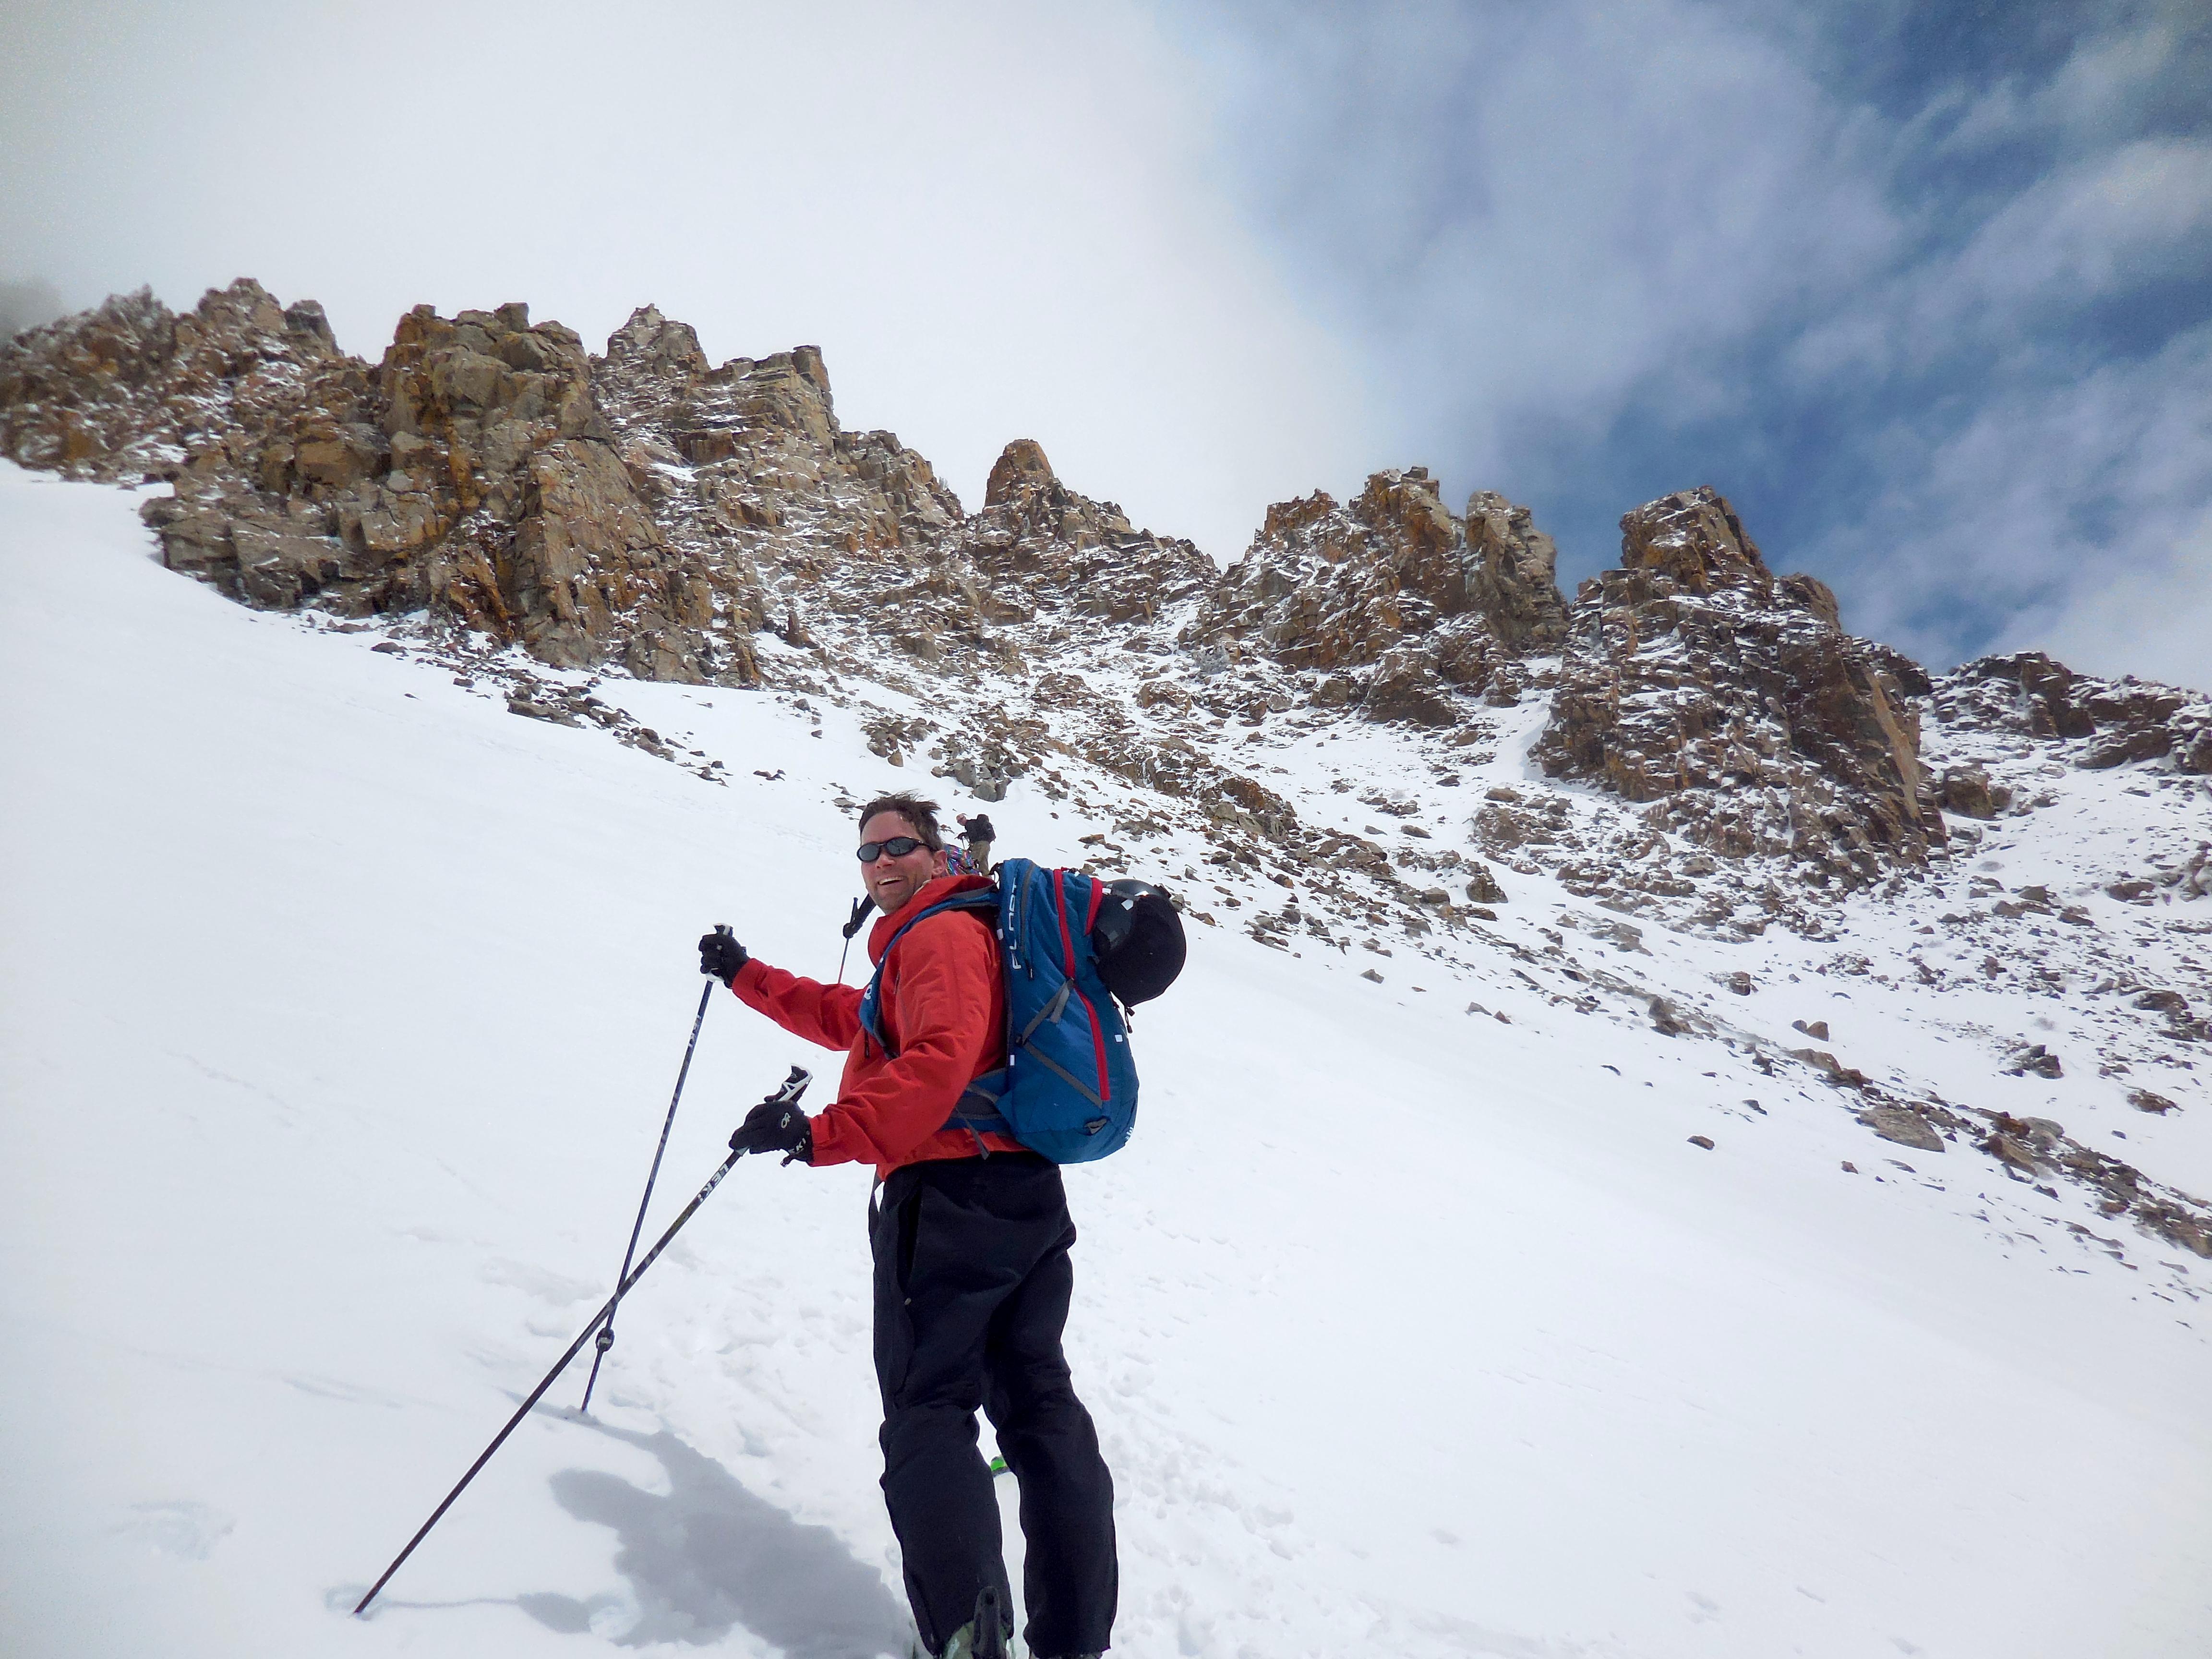 Dwanis loving the up. photo: miles clark/snowbrains